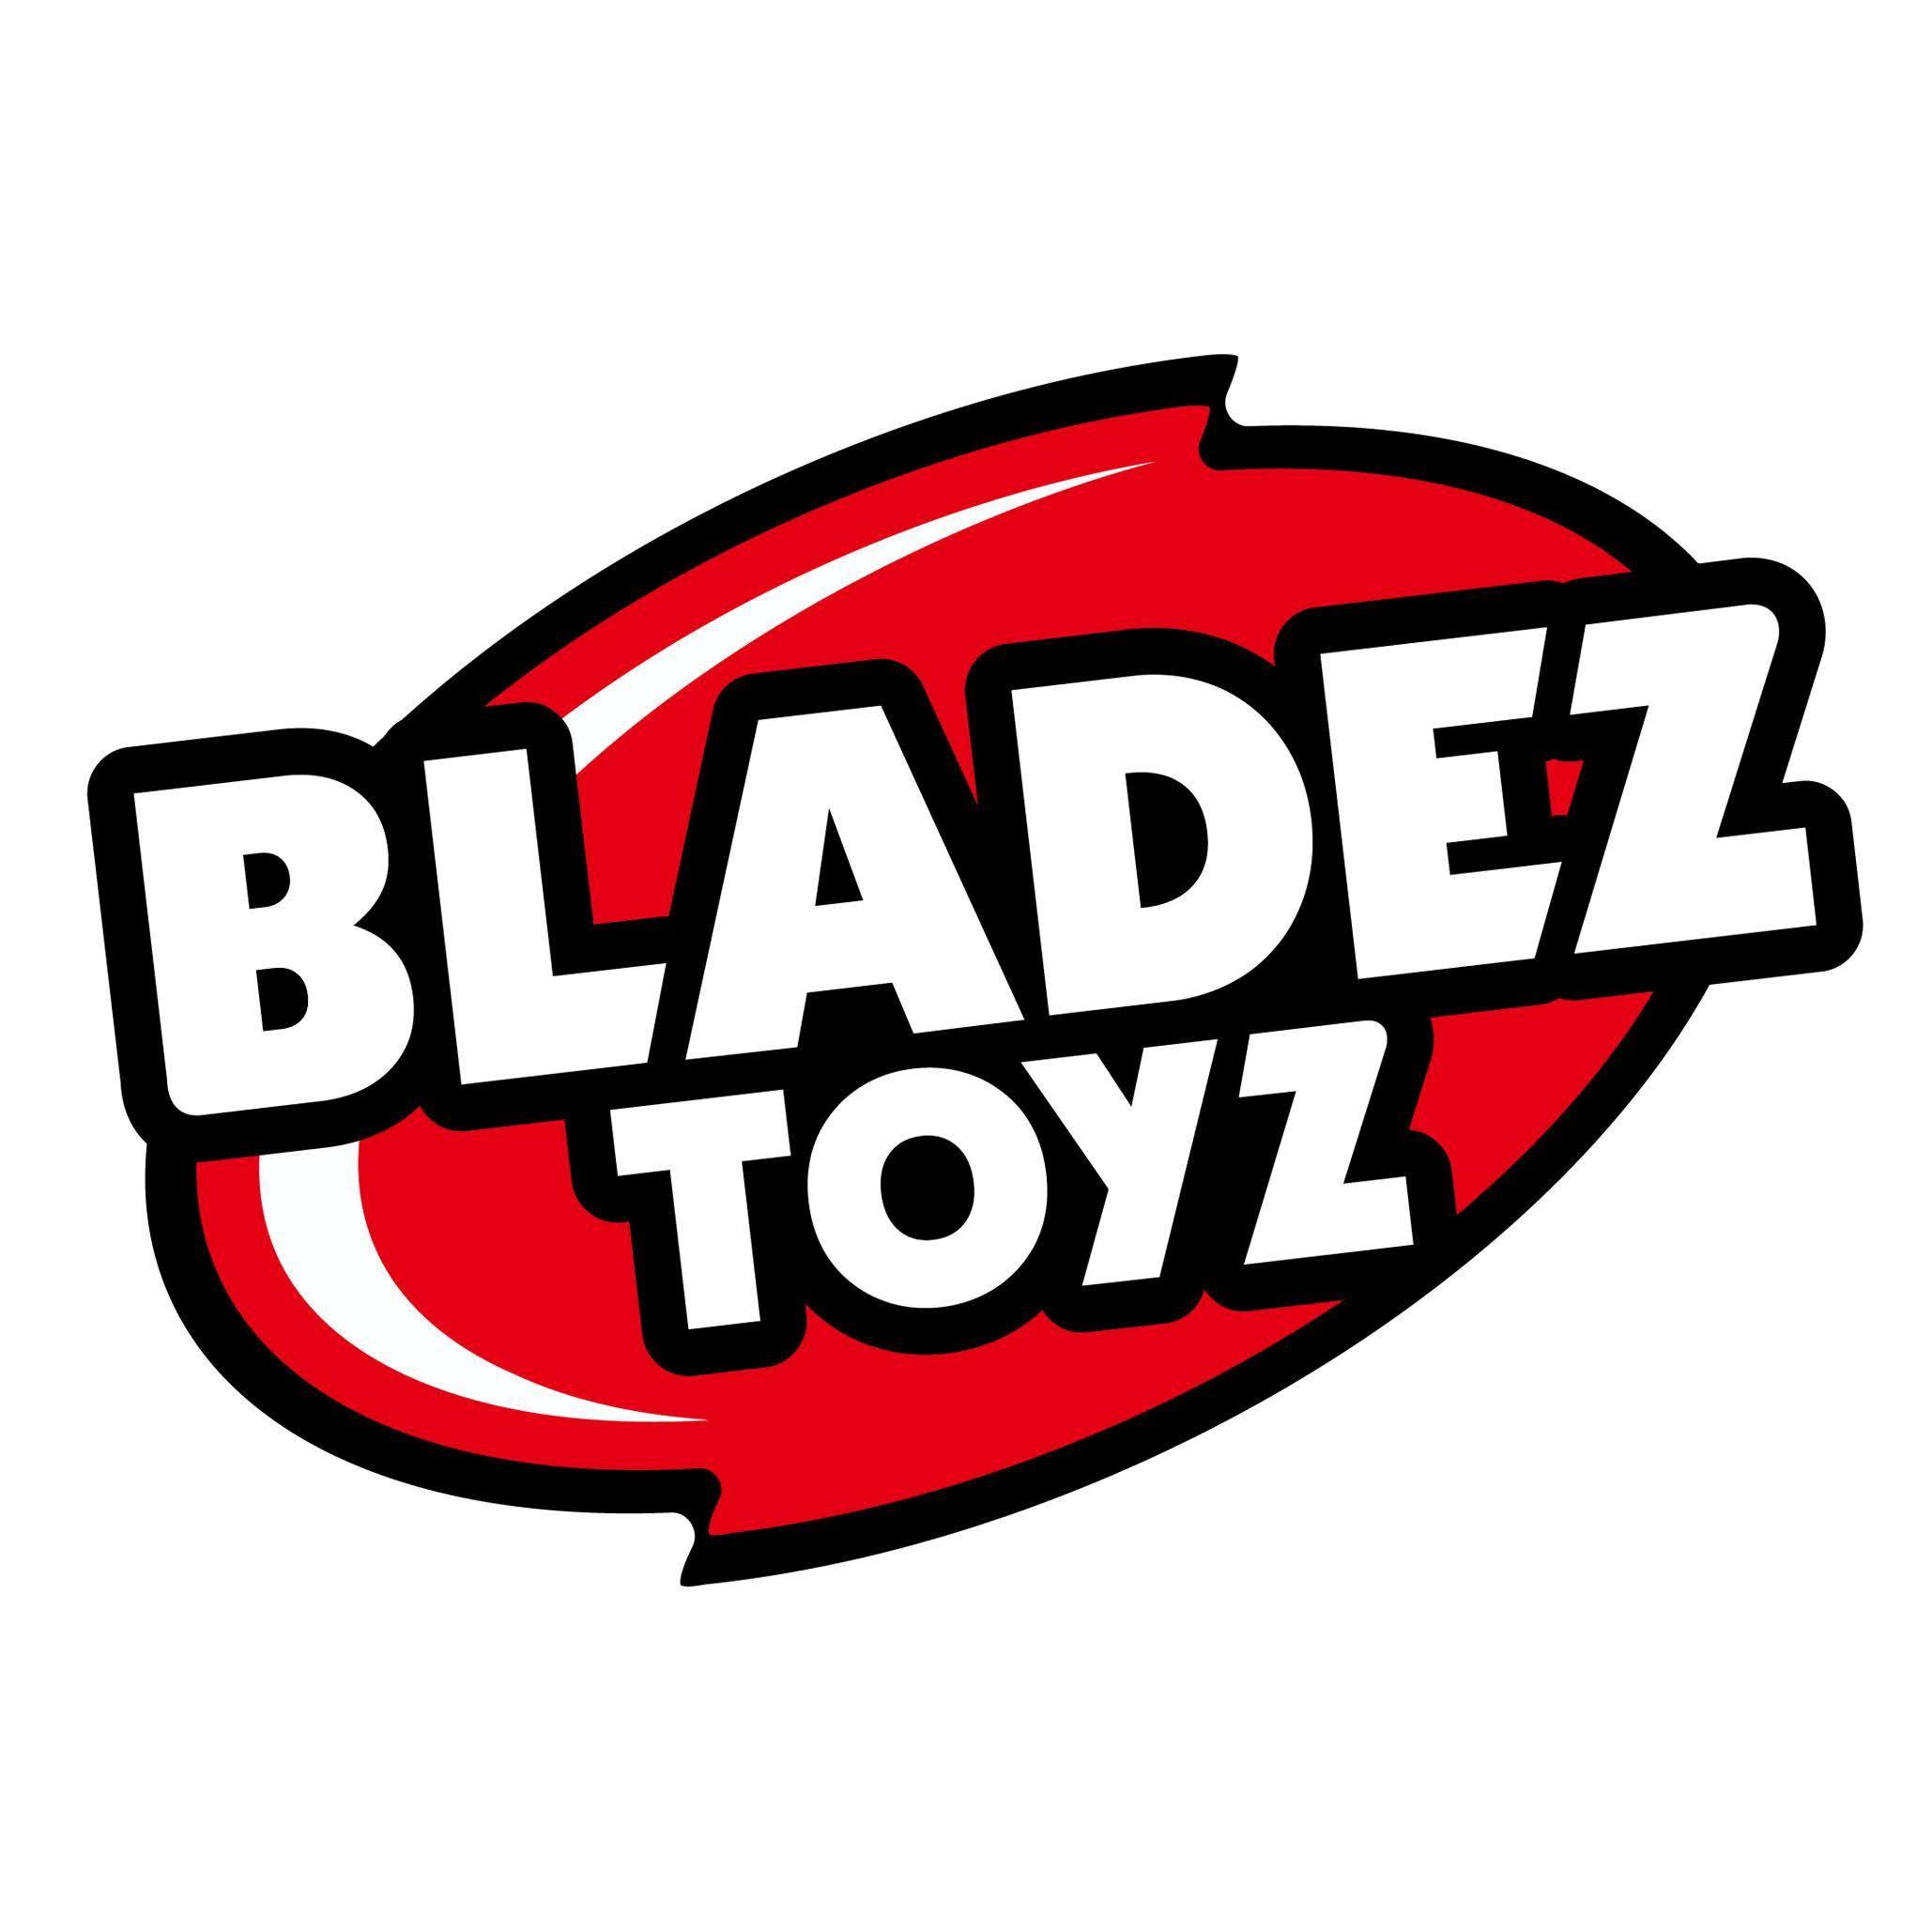 Bladez Toyz Ltd